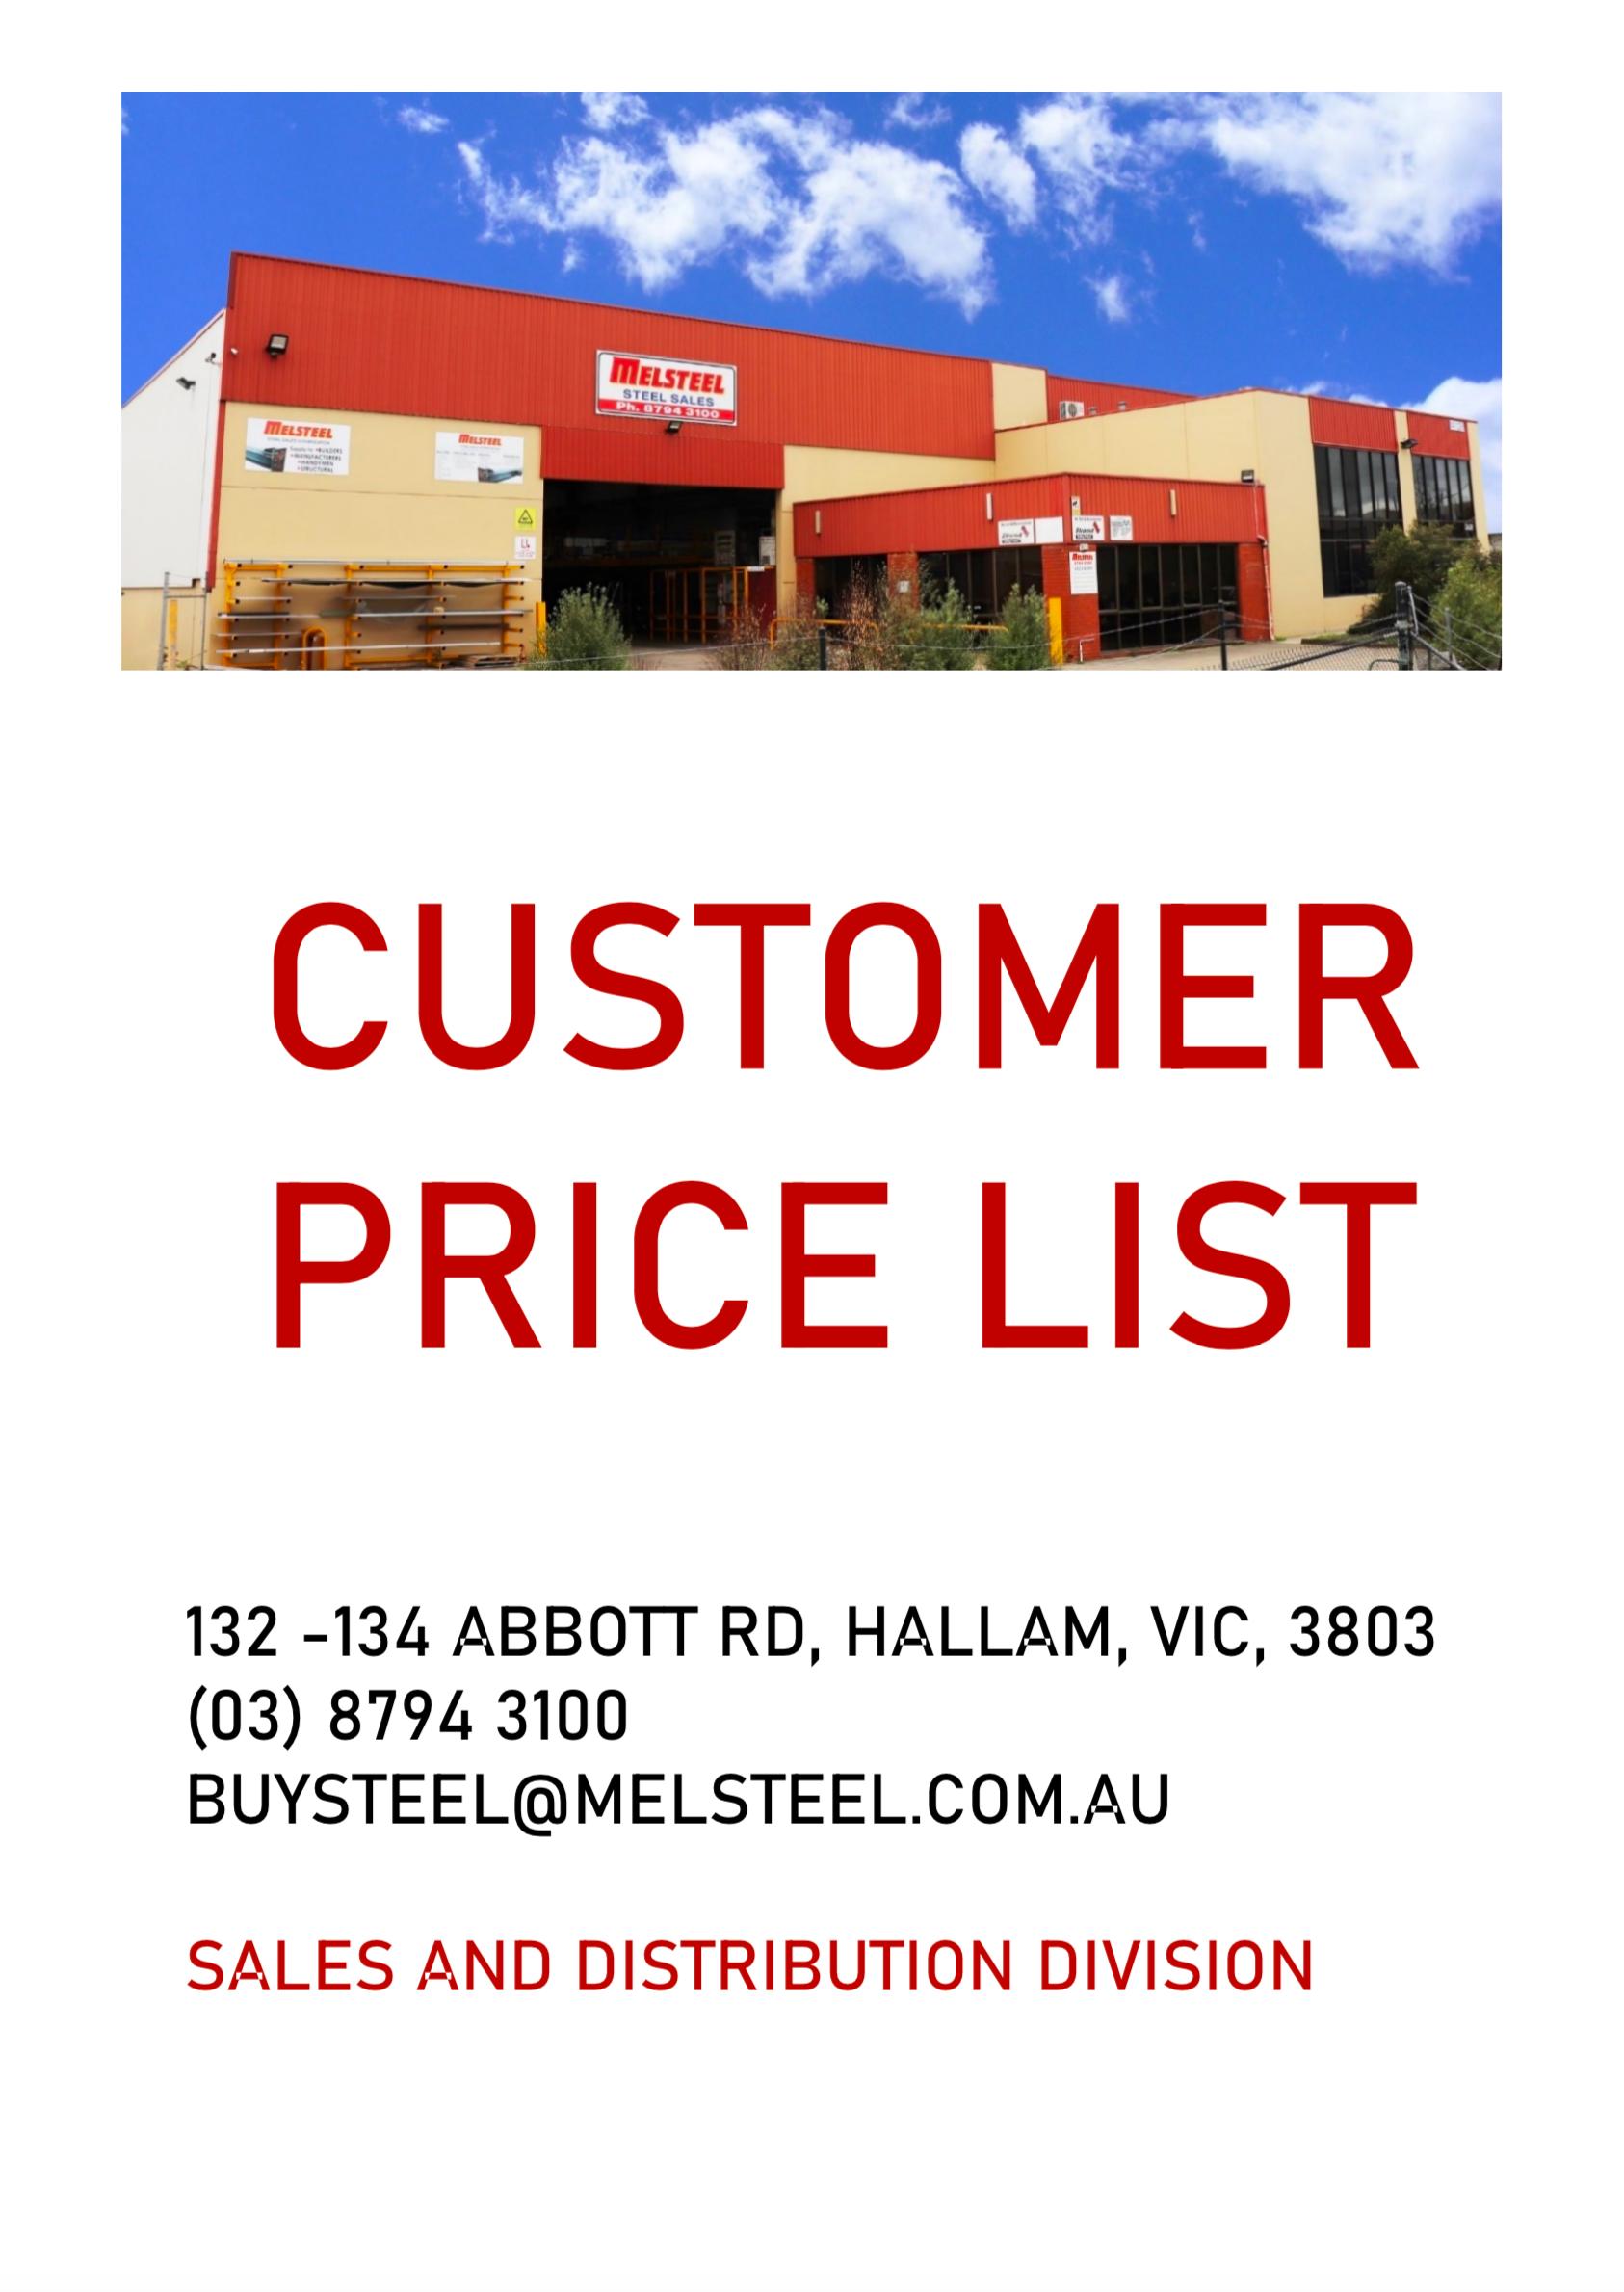 Customer Steel Price List Free Download Melsteel